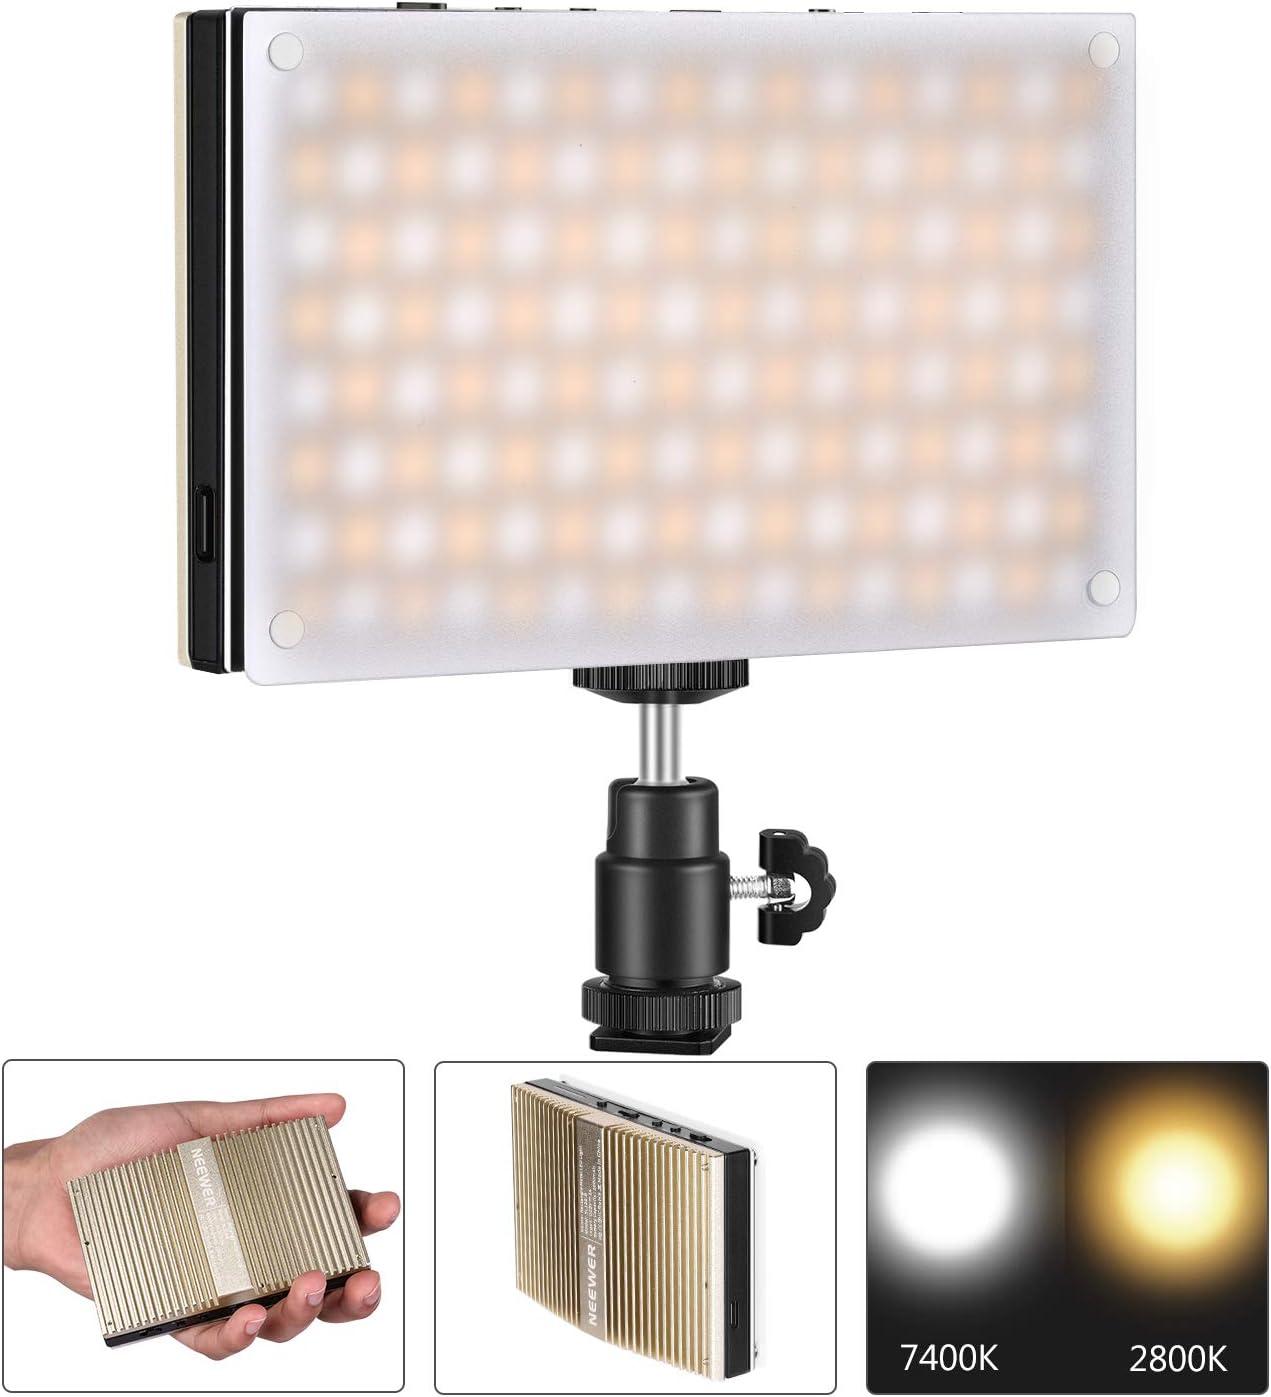 Neewer SL128-A Luz de Video LED de Bolsillo 128 LED SMD Bicolor Regulable 2800-7400K CRI95+ con Modo de Refuerzo y Batería Incorporada Carcasa Metálica con Superficie Curvada: Amazon.es: Electrónica